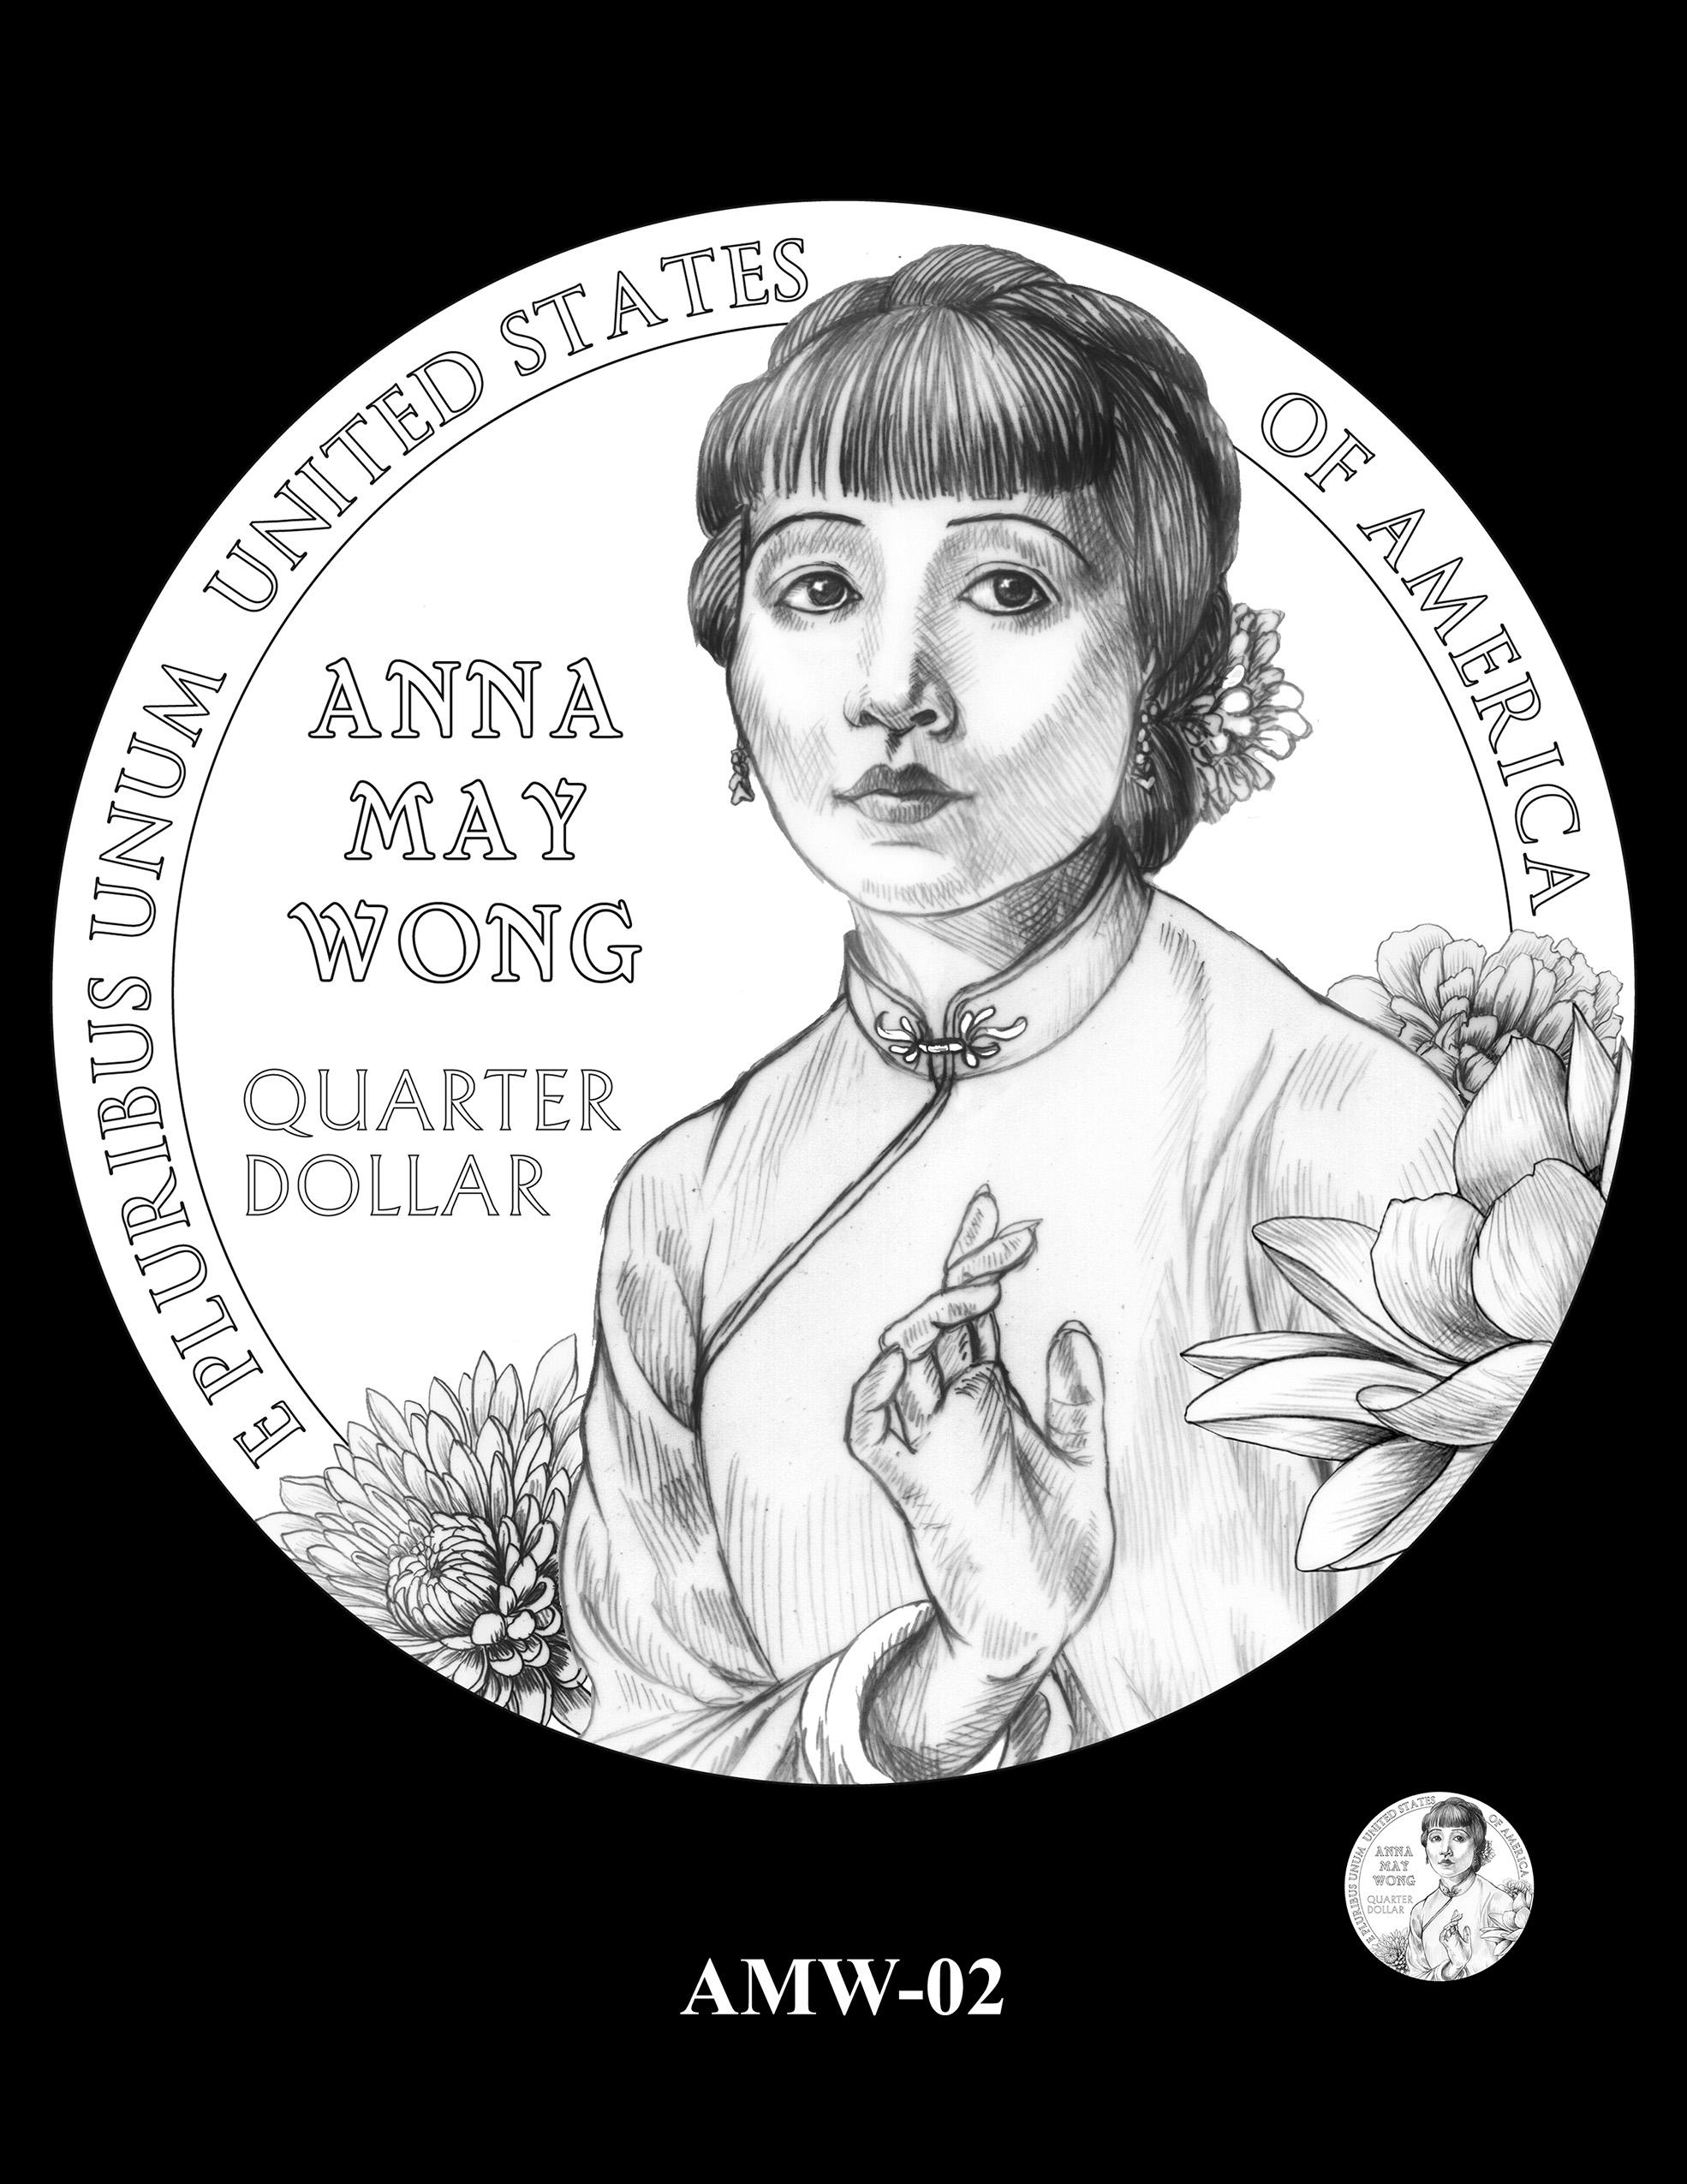 AMW-02 -- 2022 American Women Quarters - Anna May Wong